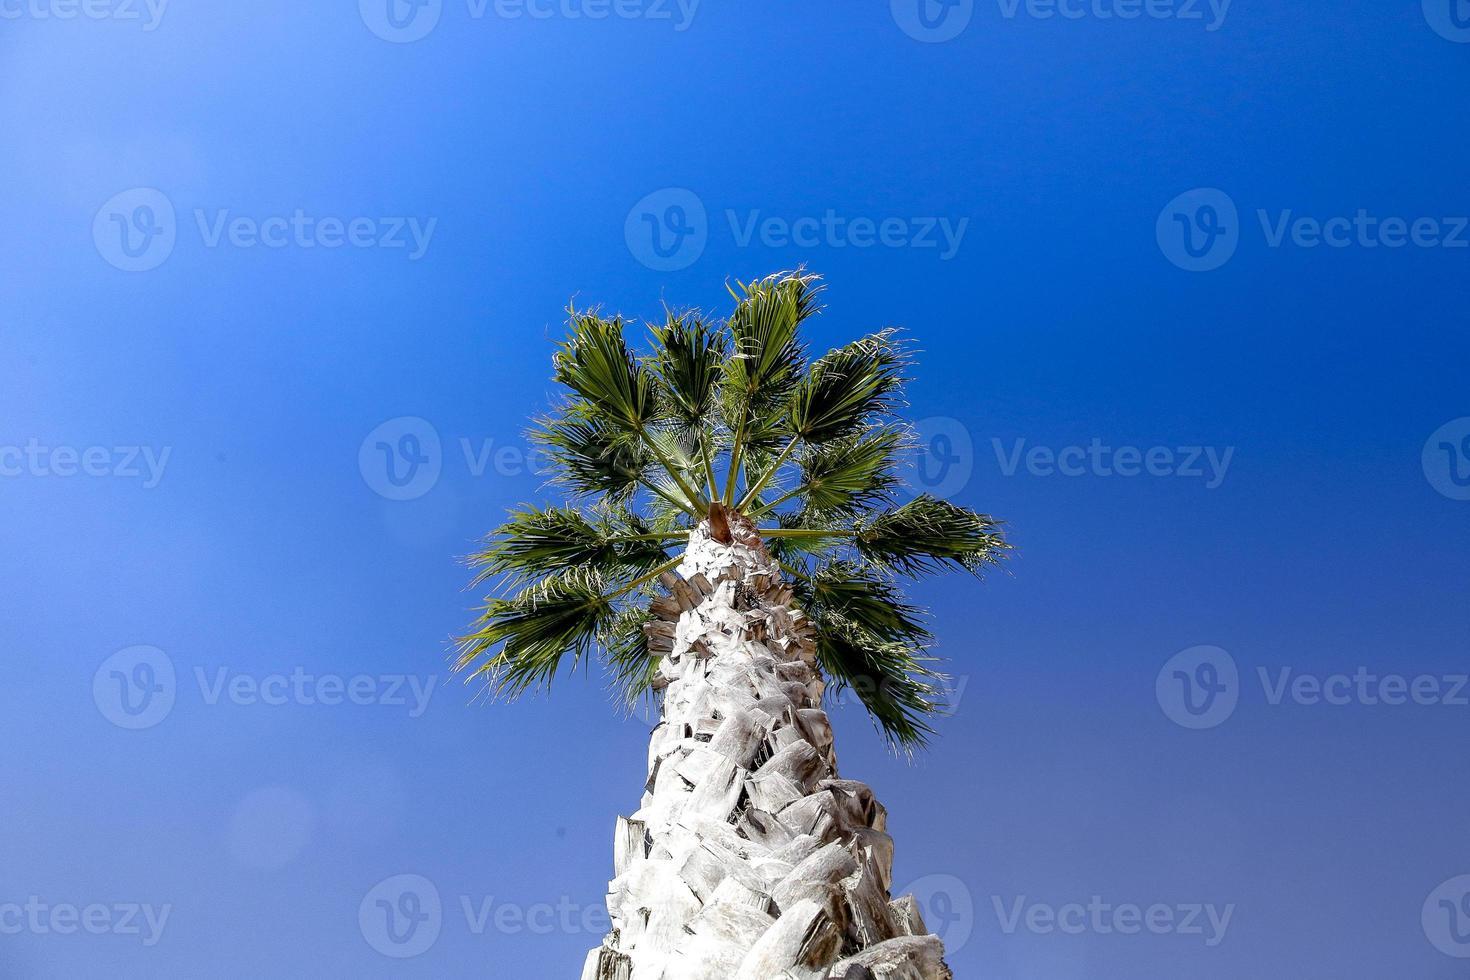 palm i lagos nära marina, portugal foto